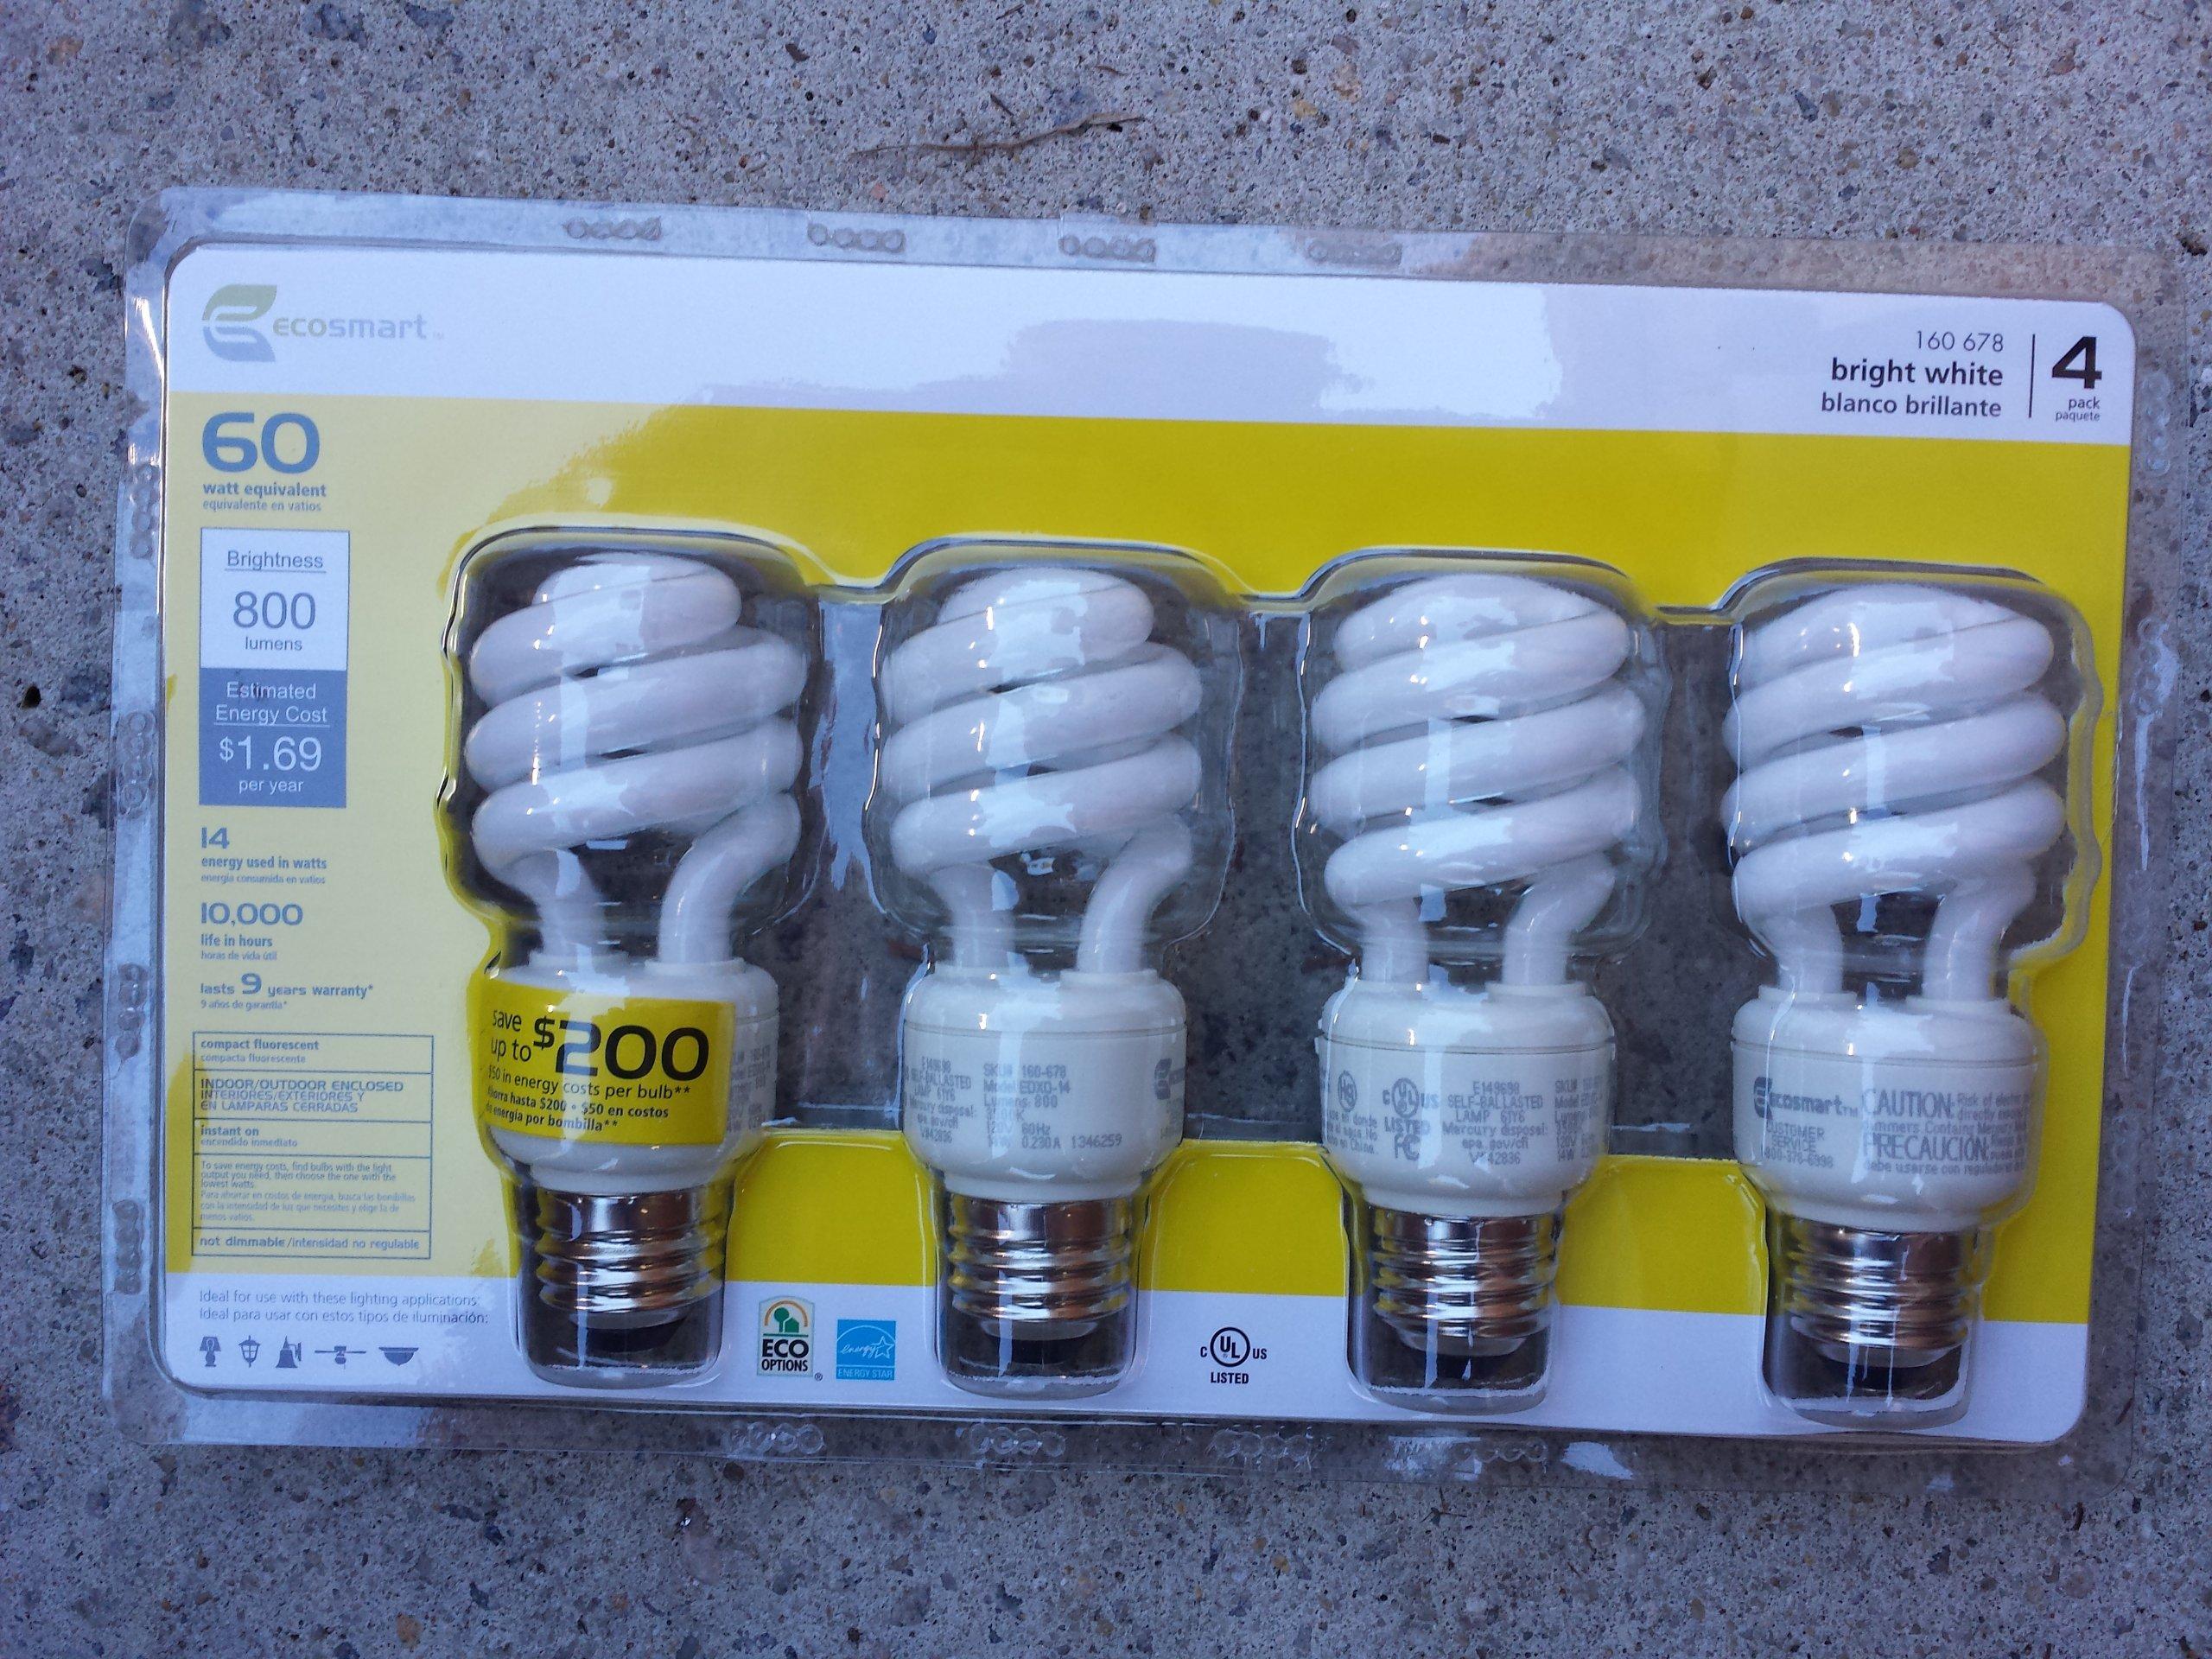 Ecosmart 60W Equivalent Spiral CFL Light Bulb, Bright White (4-Pack)